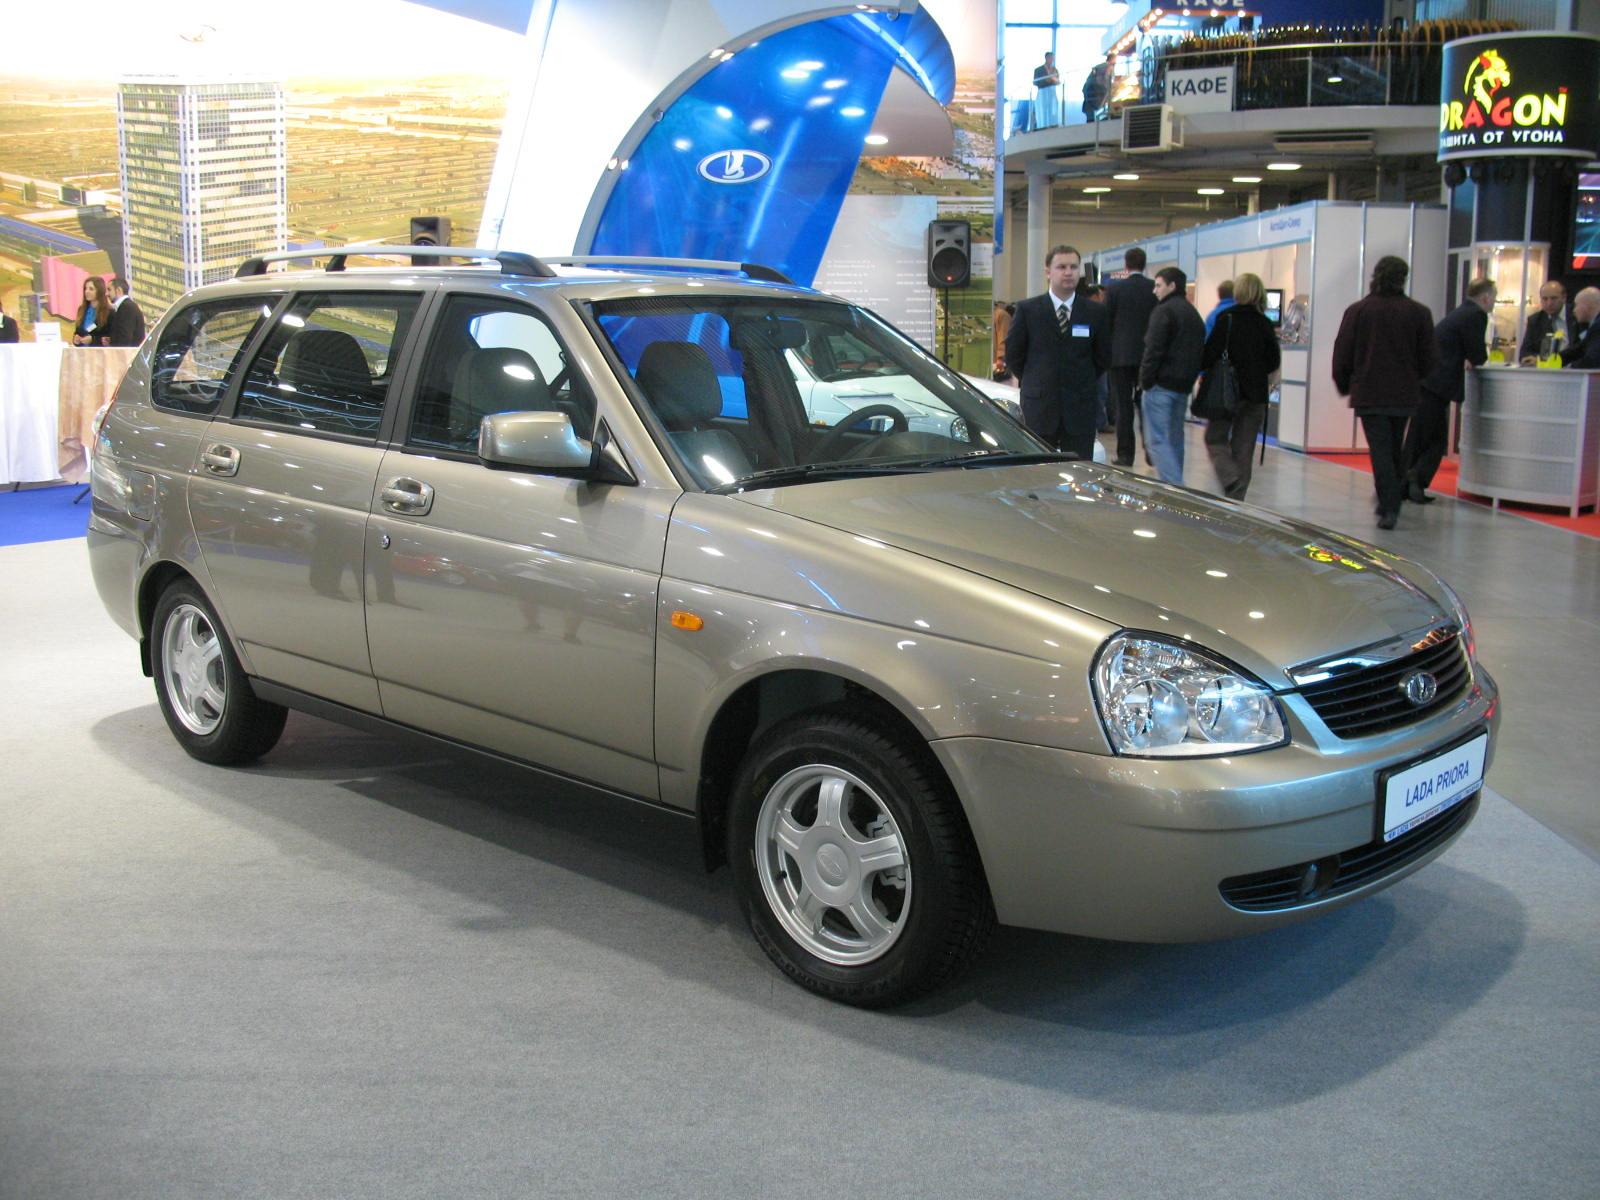 найти автомобиль ВАЗ в Санкт-Петербурге